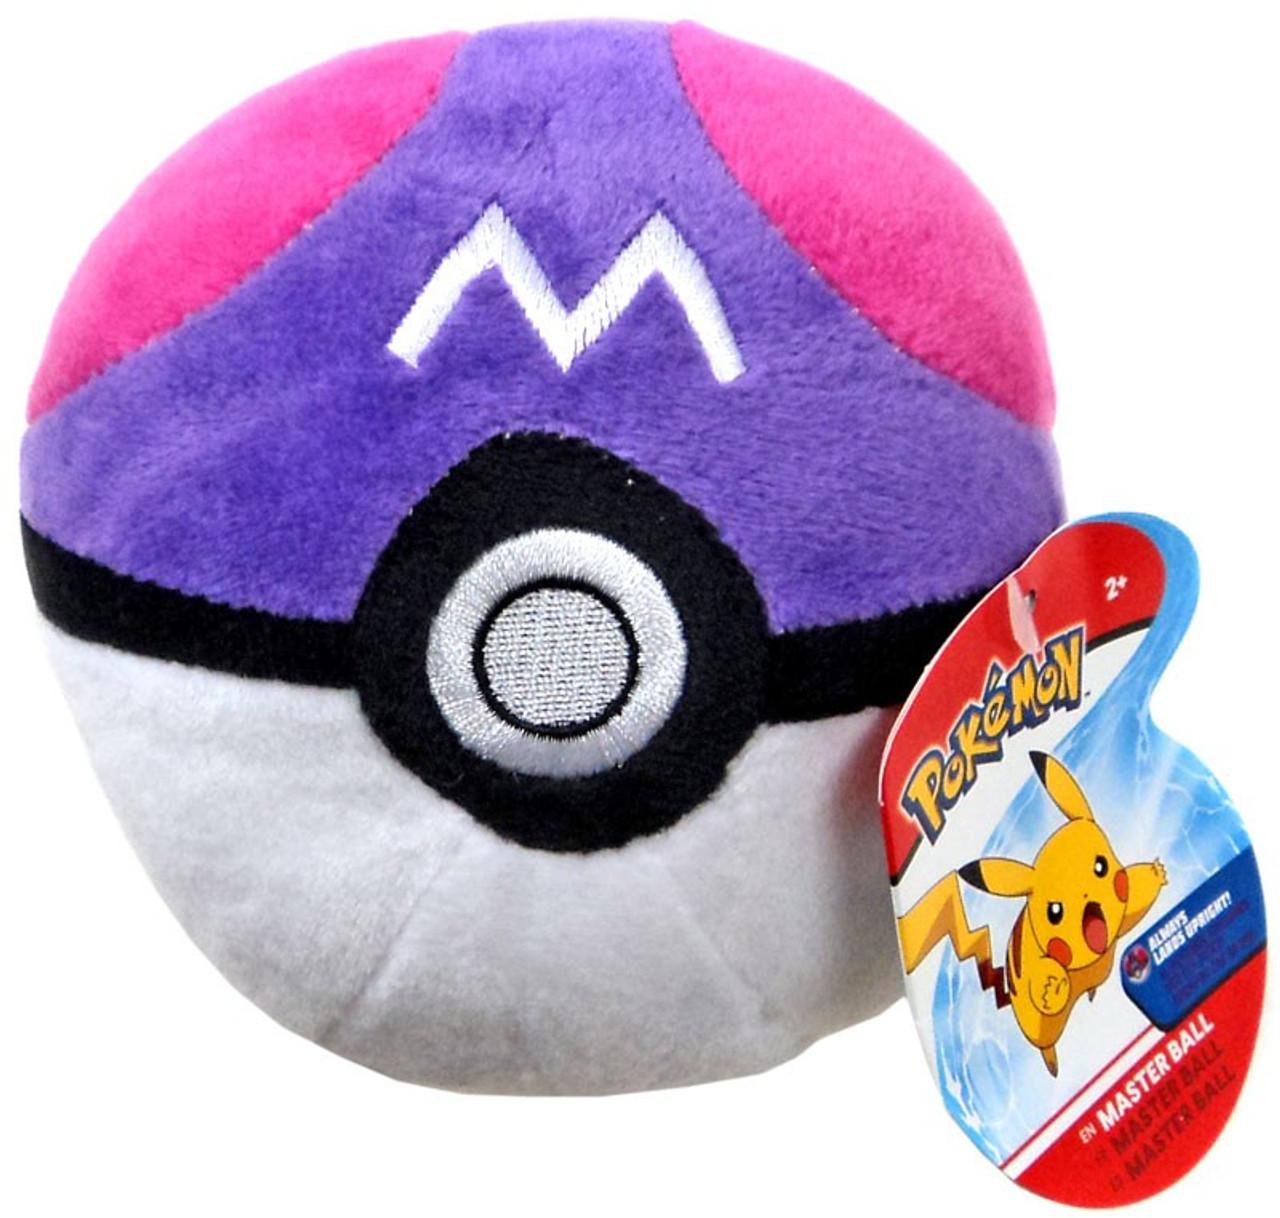 Pokemon Pokeball Master Ball 5 Plush Wicked Cool Toys Toywiz